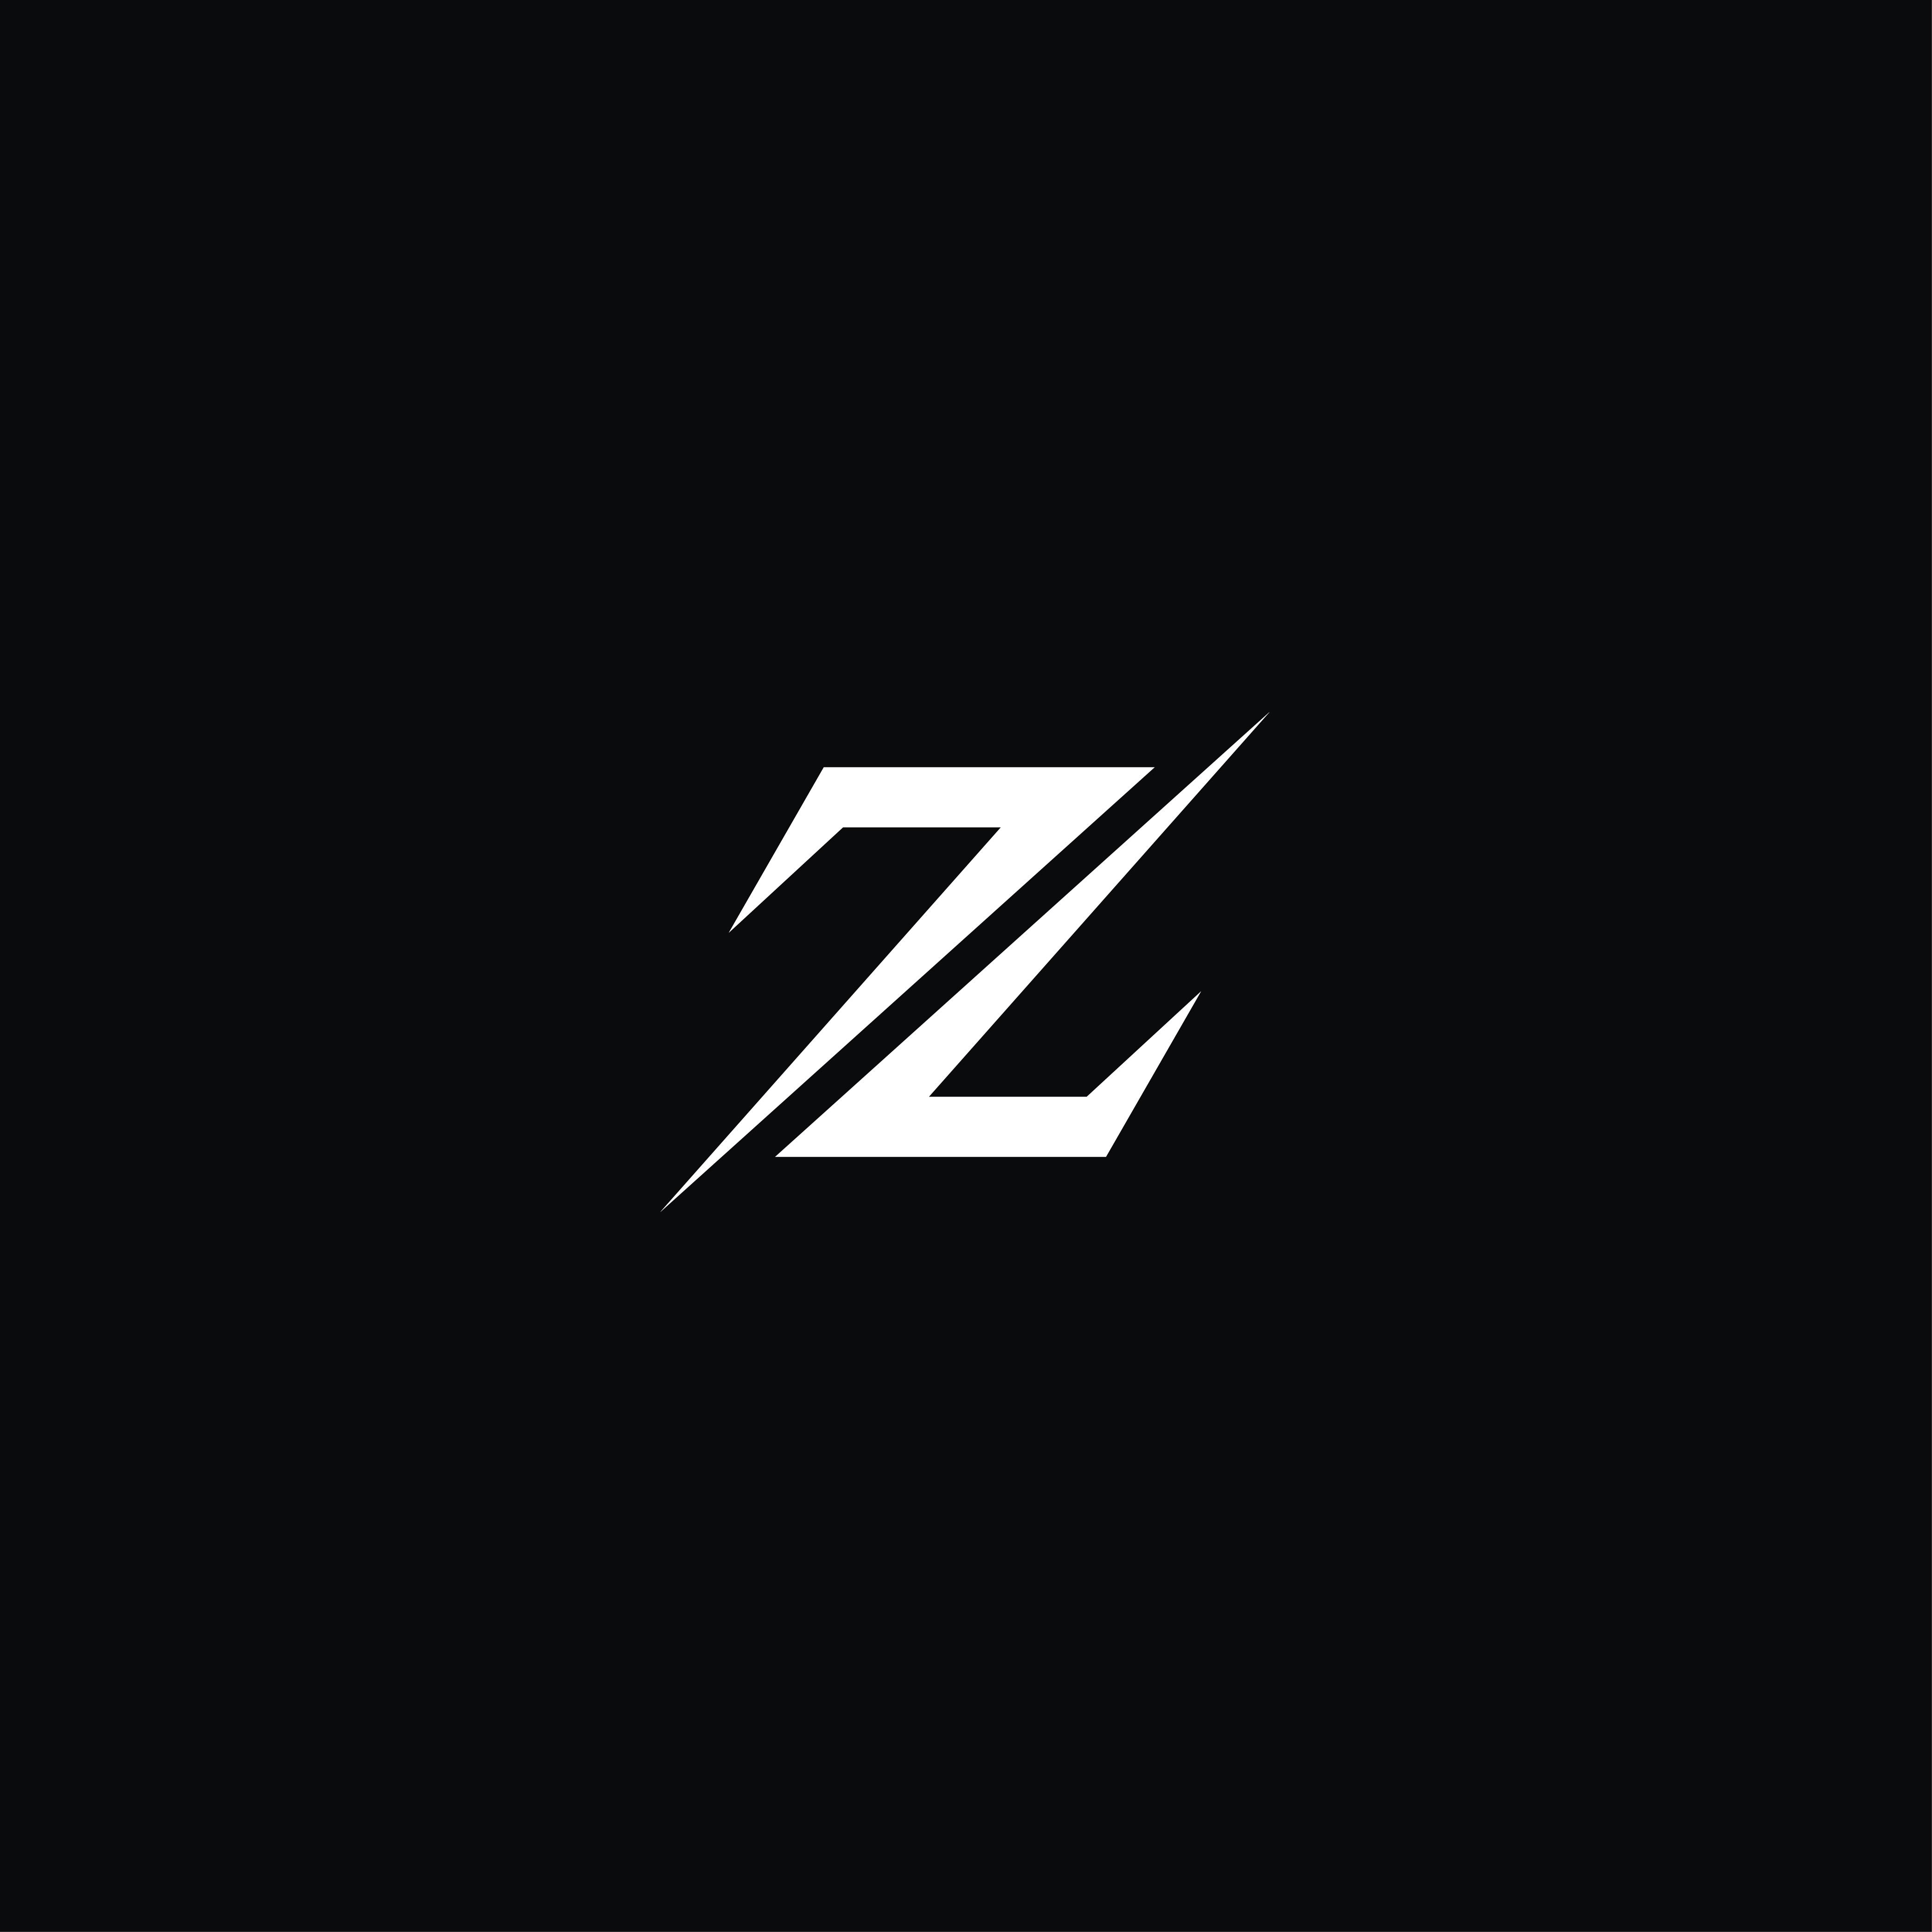 Creative Logo Design Vector Free Download